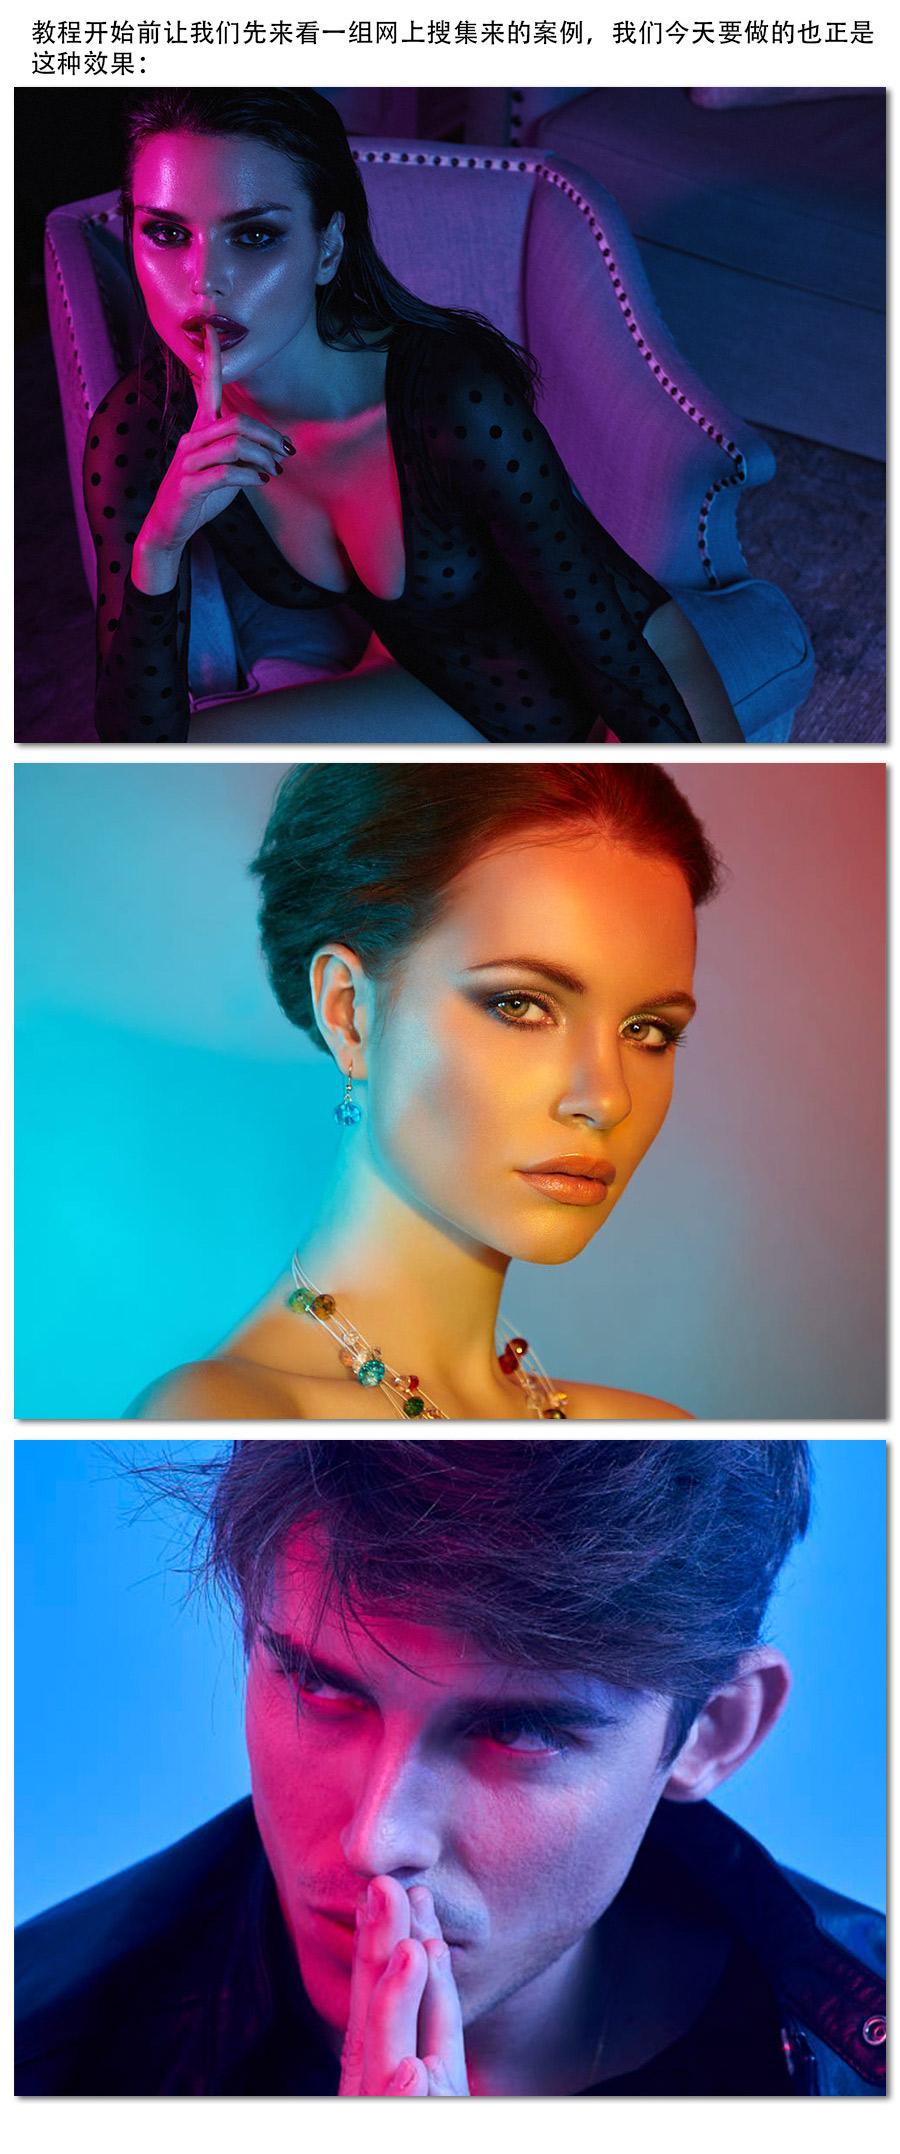 Photoshop制作壮丽的红蓝渐变人像结果教程